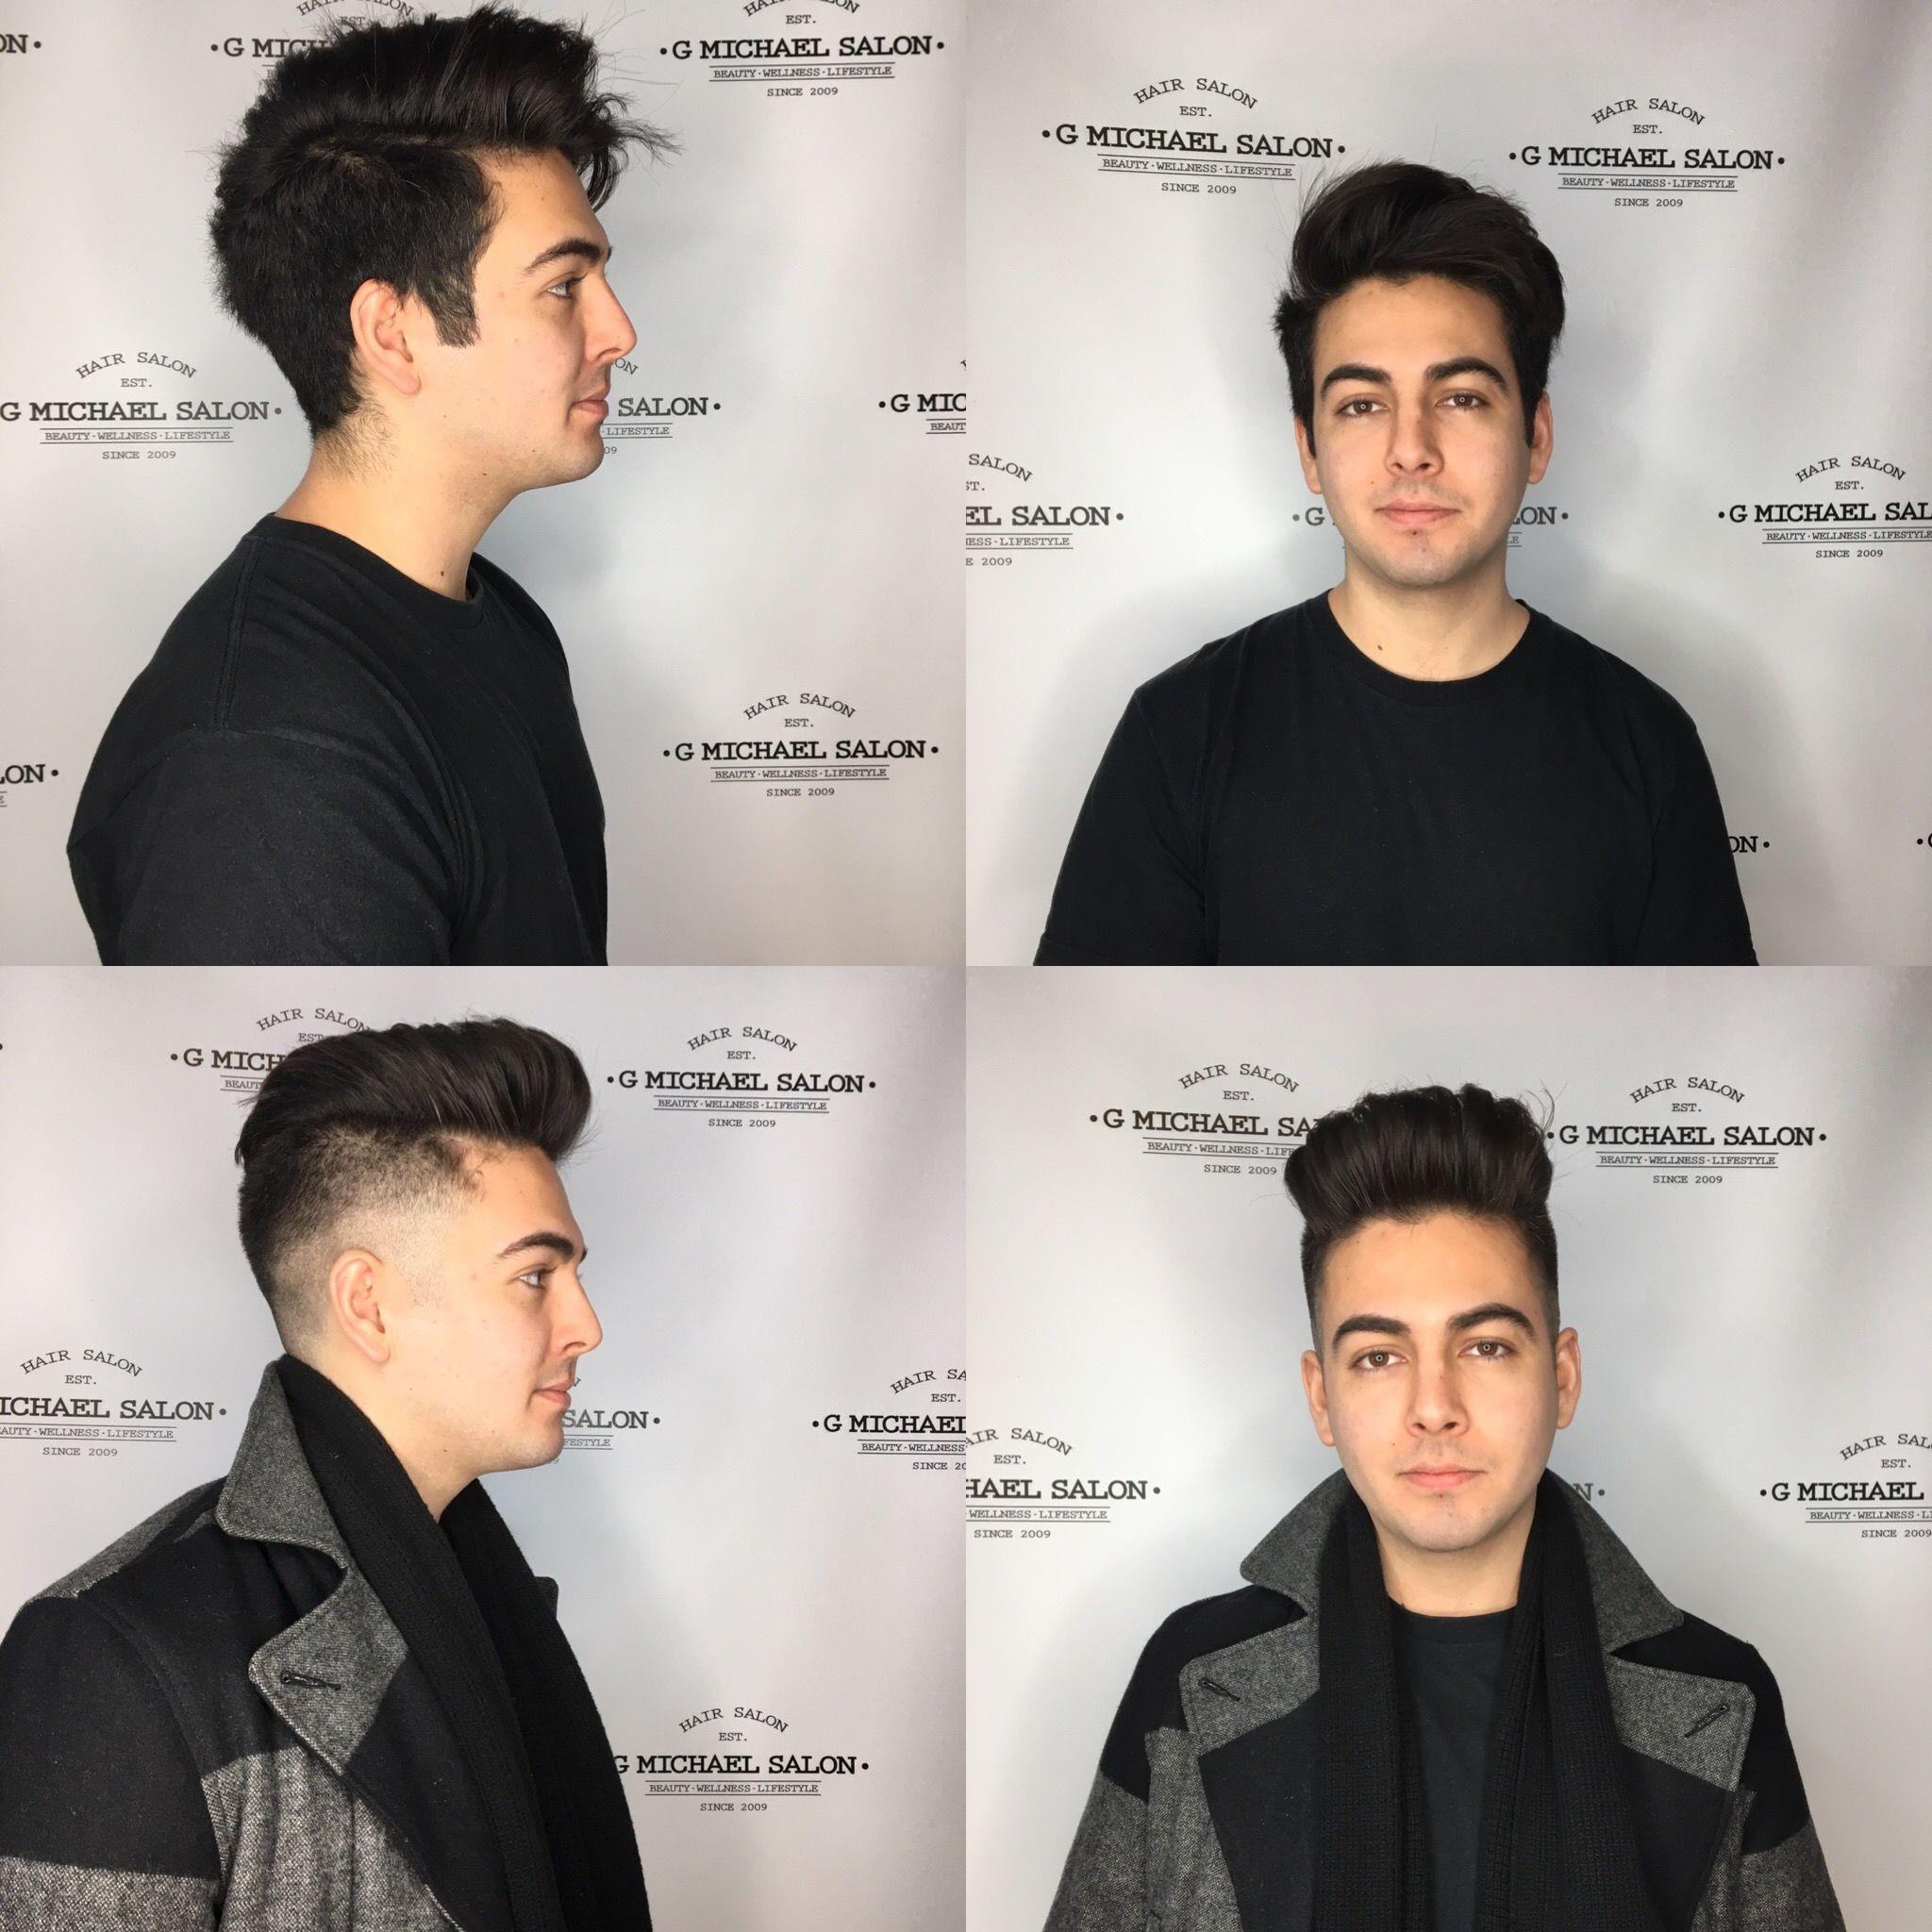 Best Indianapolis Men s Haircuts by G Michael Salon men mens hair